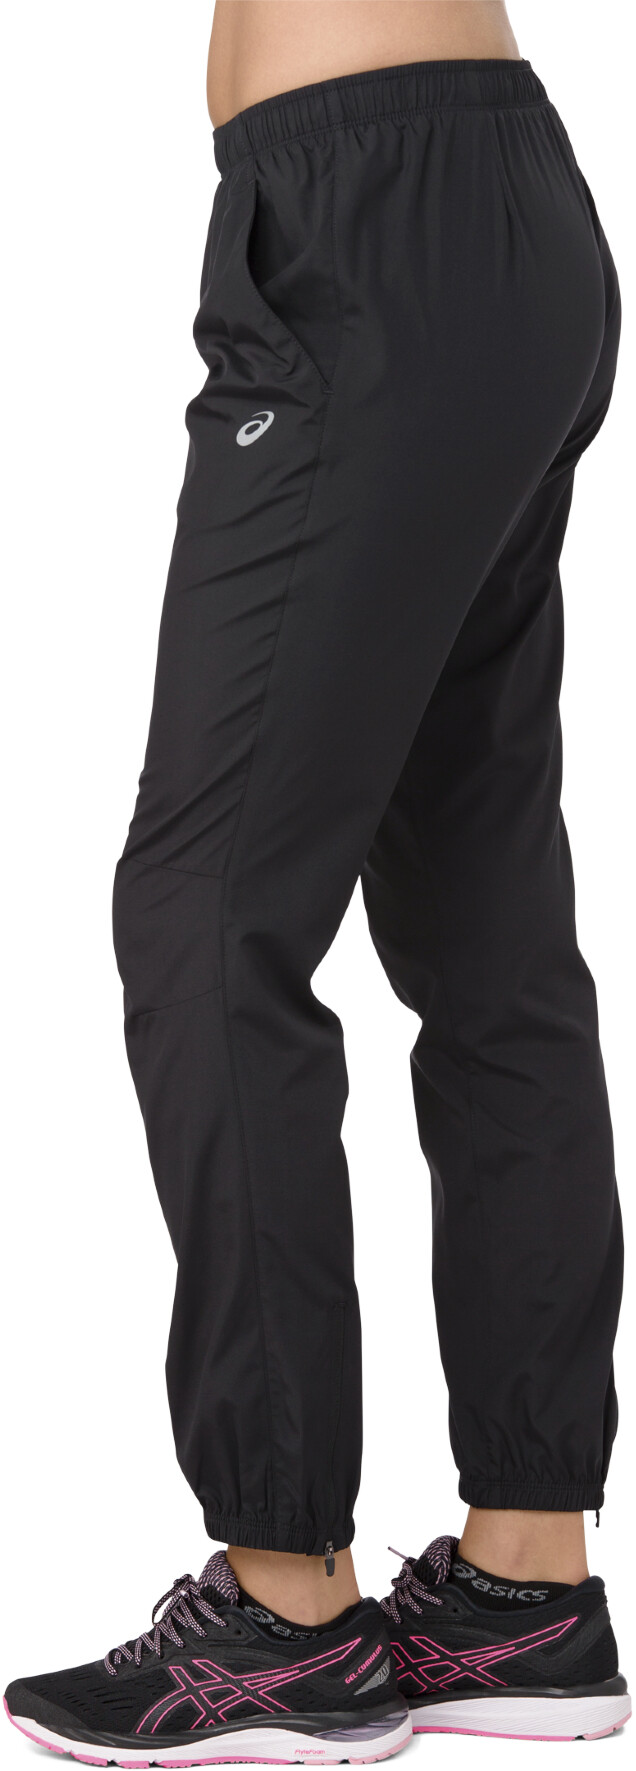 e7310f033 asics Silver Woven Pants Women performance black